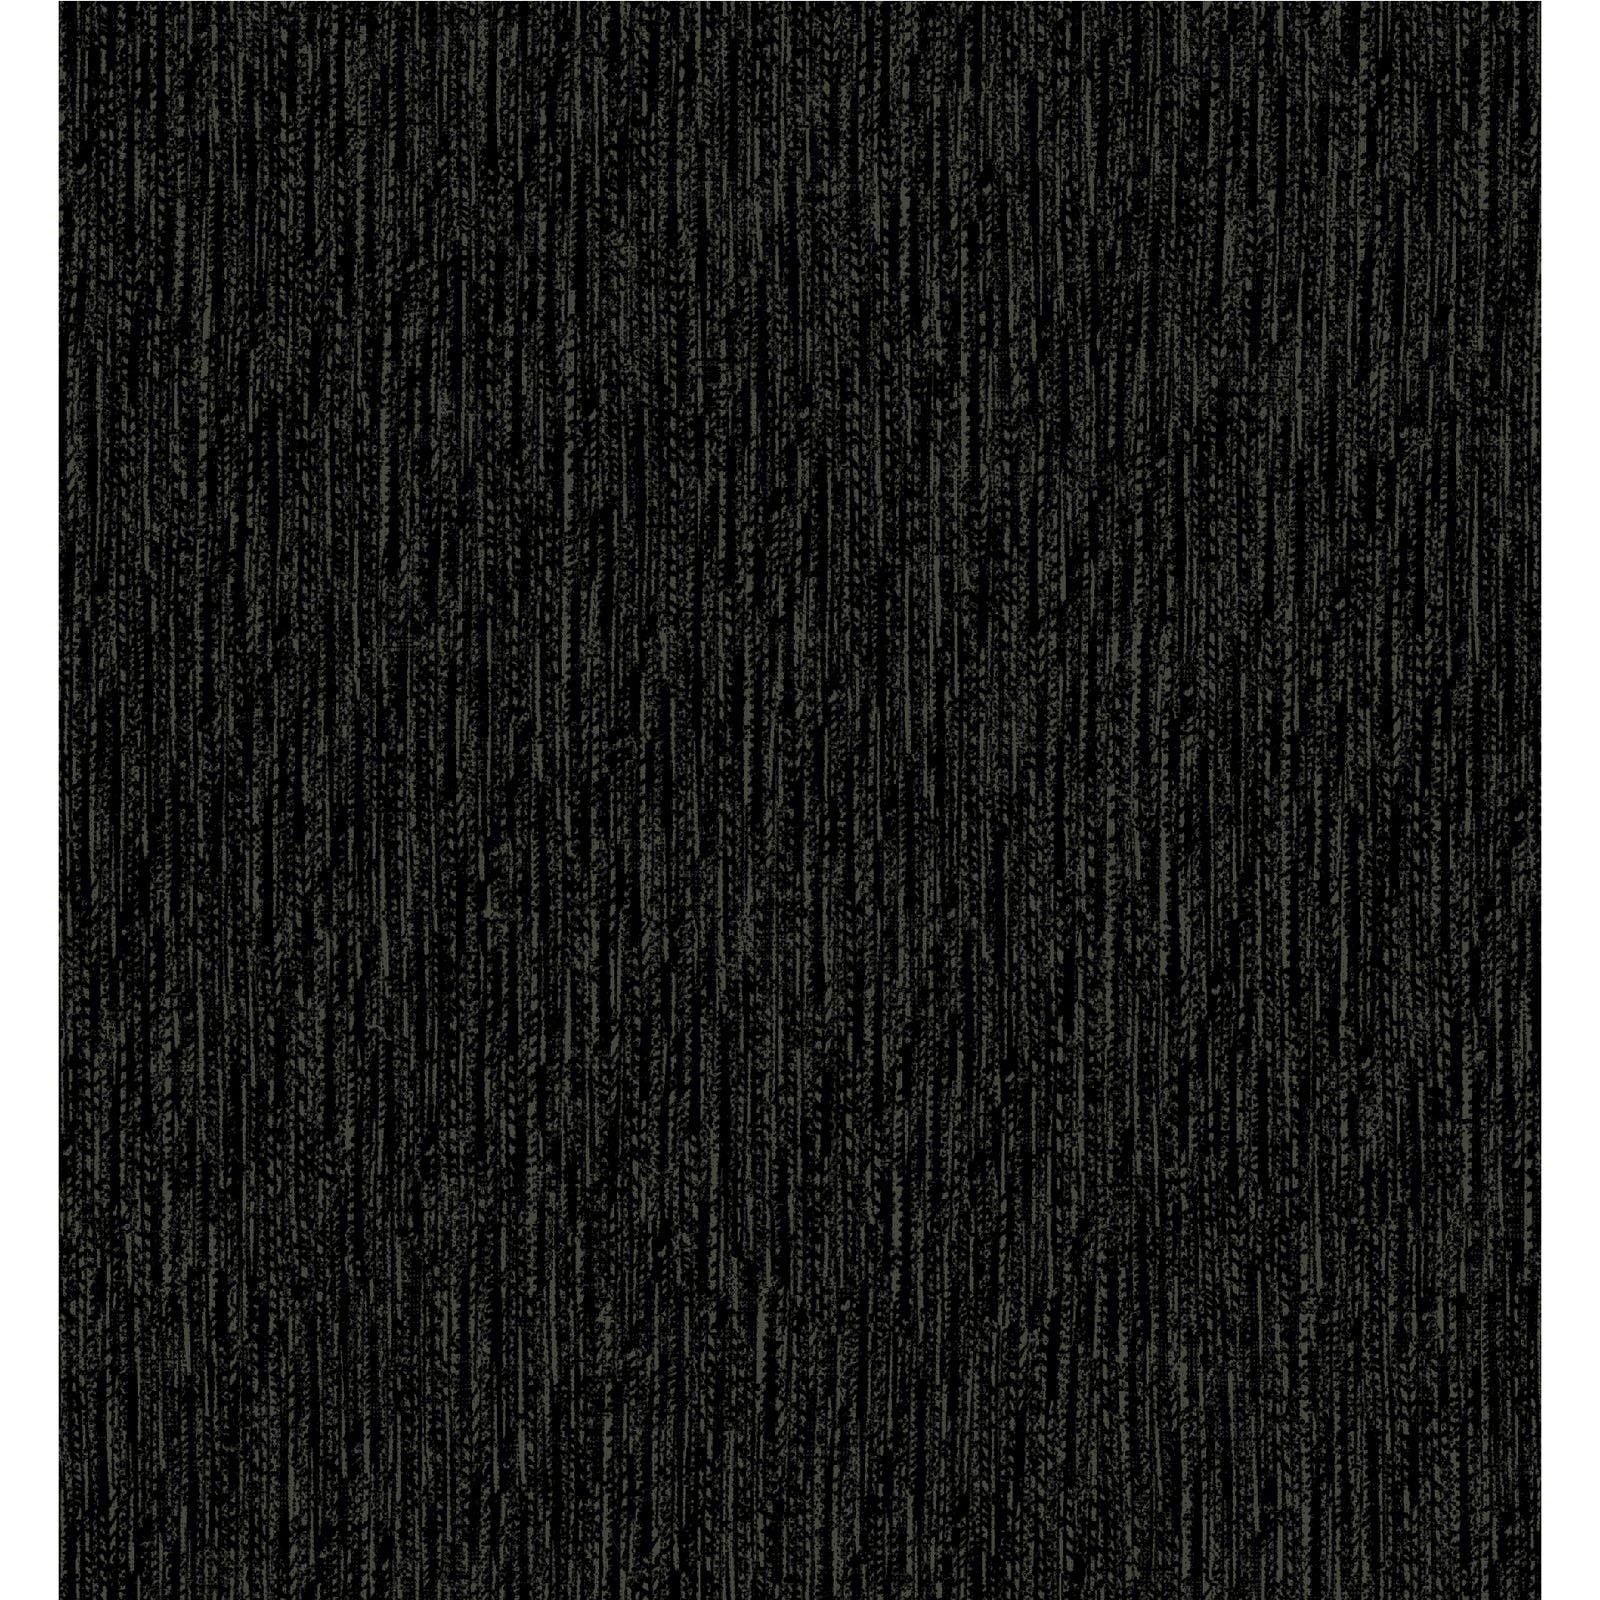 INTH-2TG 1 - TEXTURE-GRAPHIX BY JASON YENTER VERTICAL BLACK